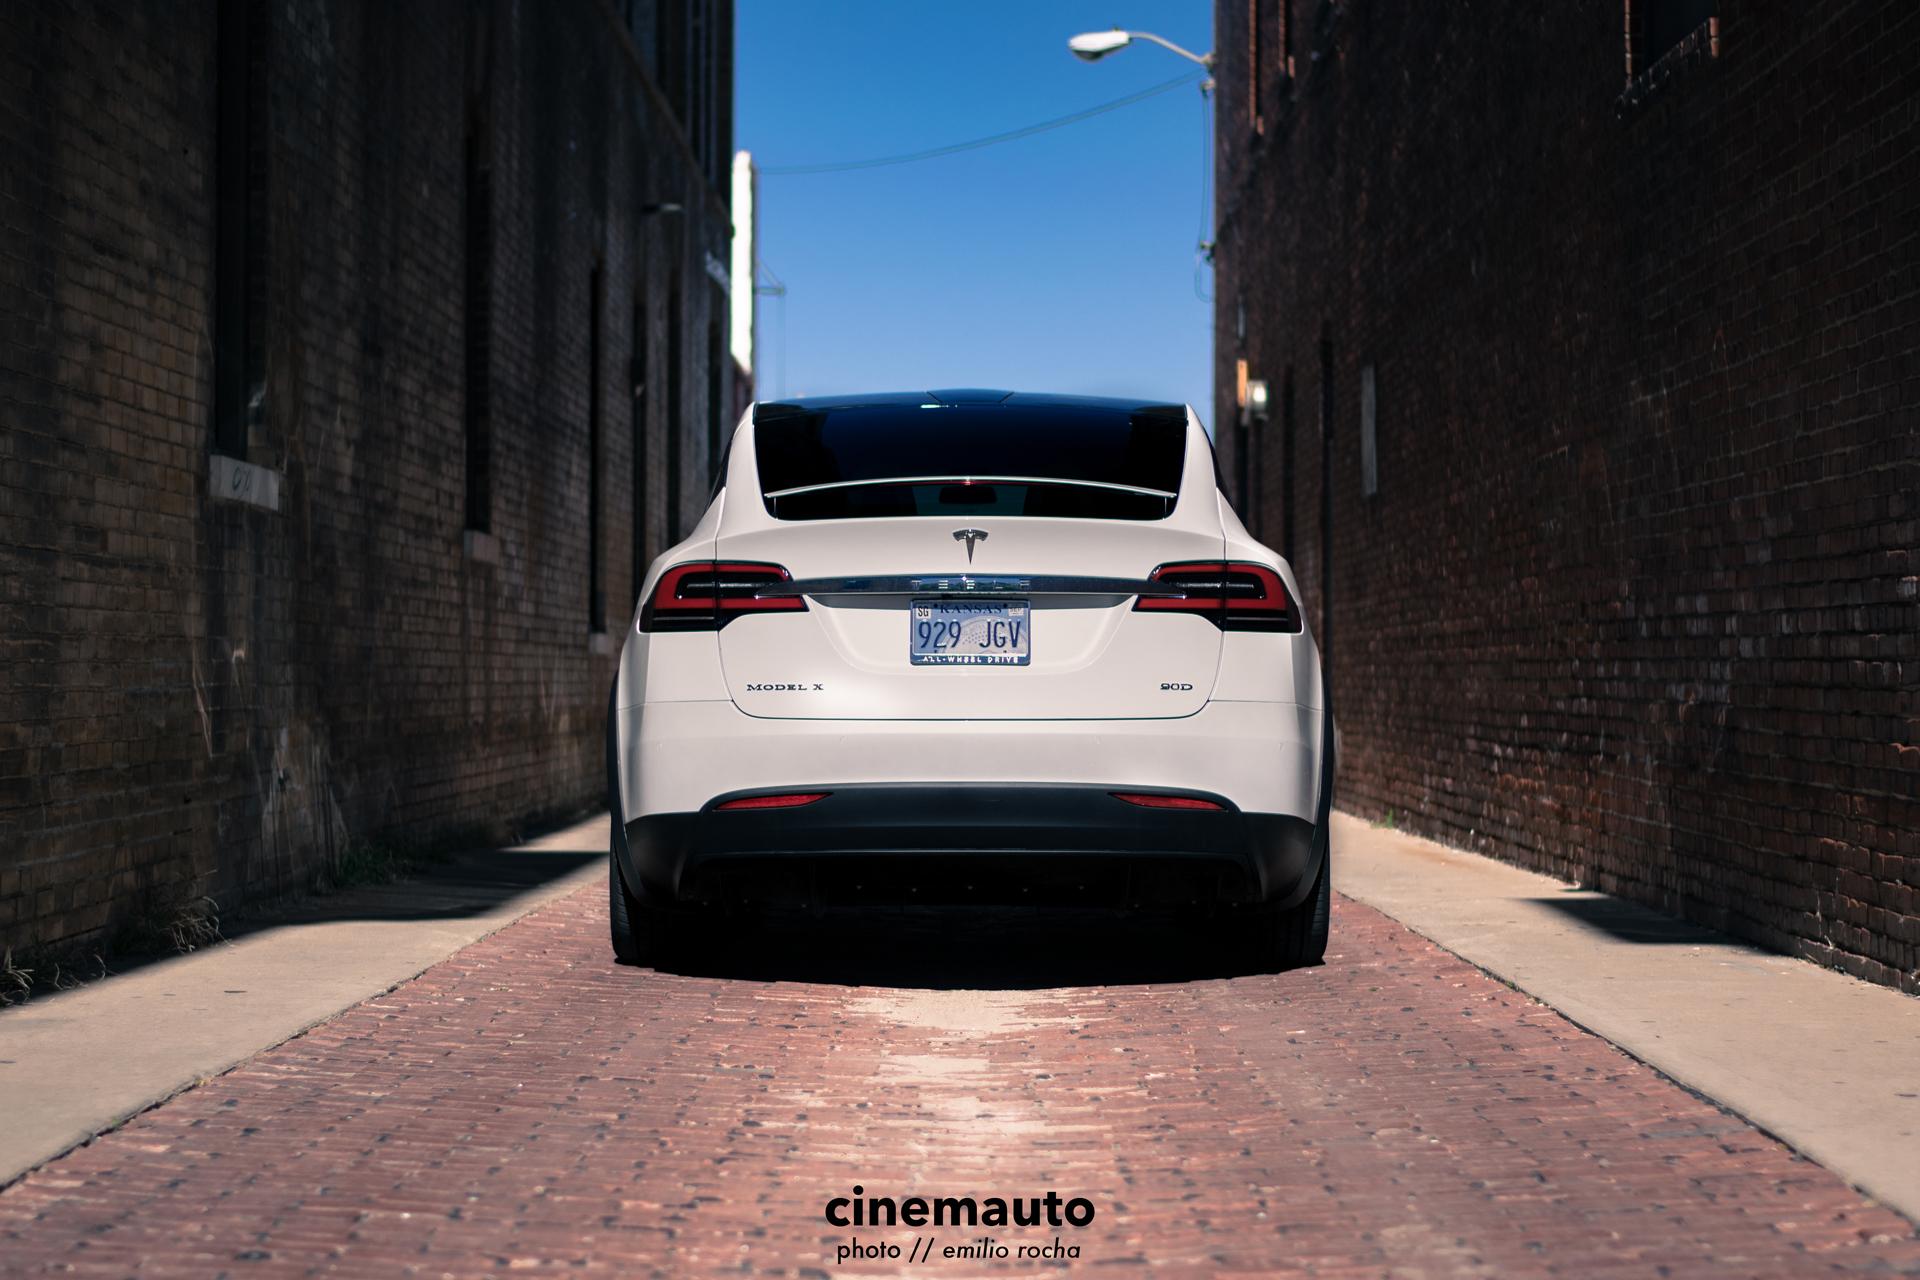 TeslaCinemauto-26.jpg